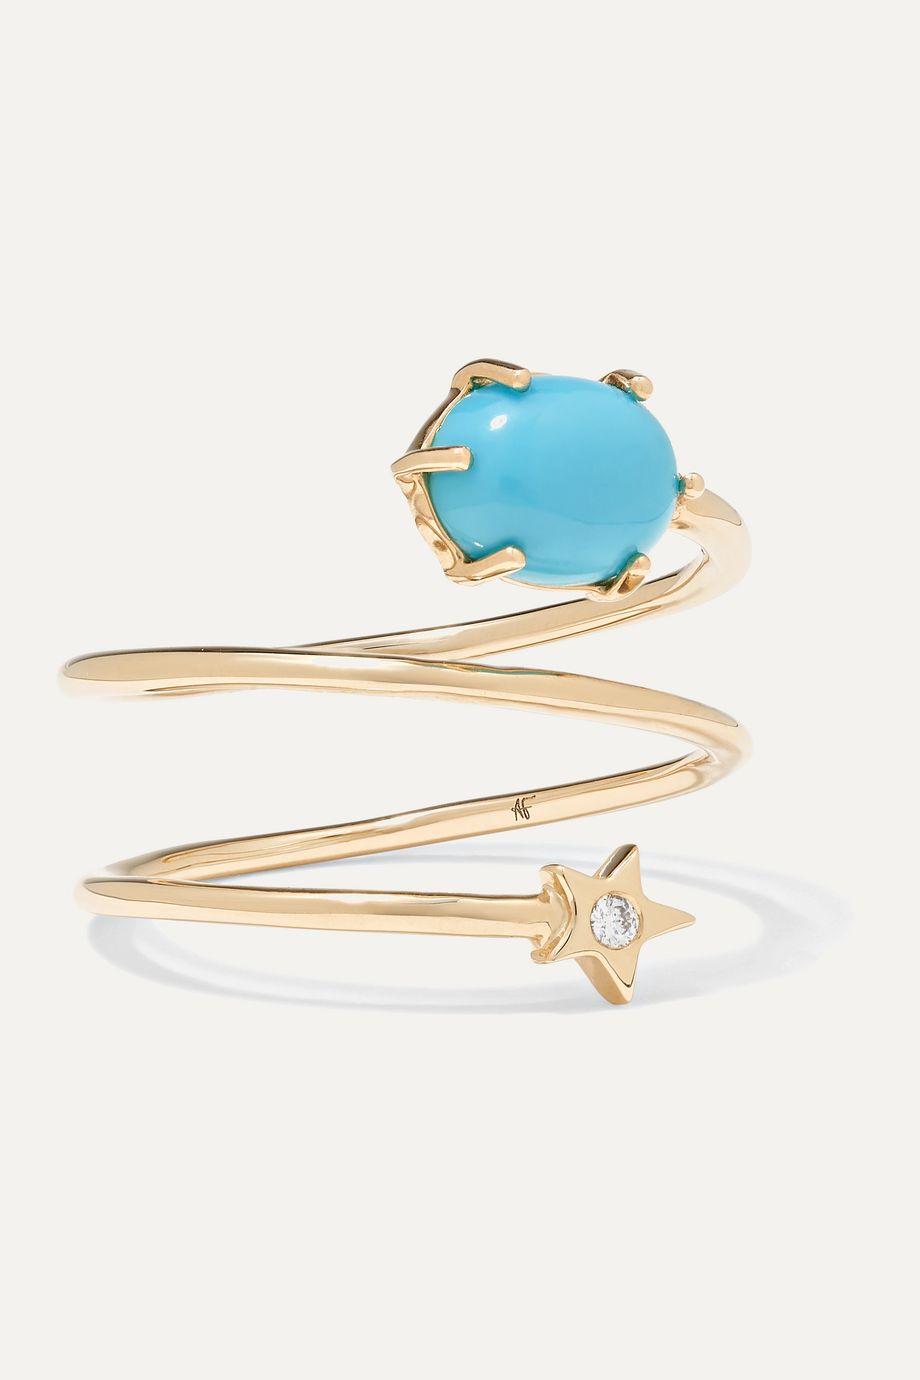 Andrea Fohrman Mini Cosmo 14-karat gold, turquoise and diamond ring